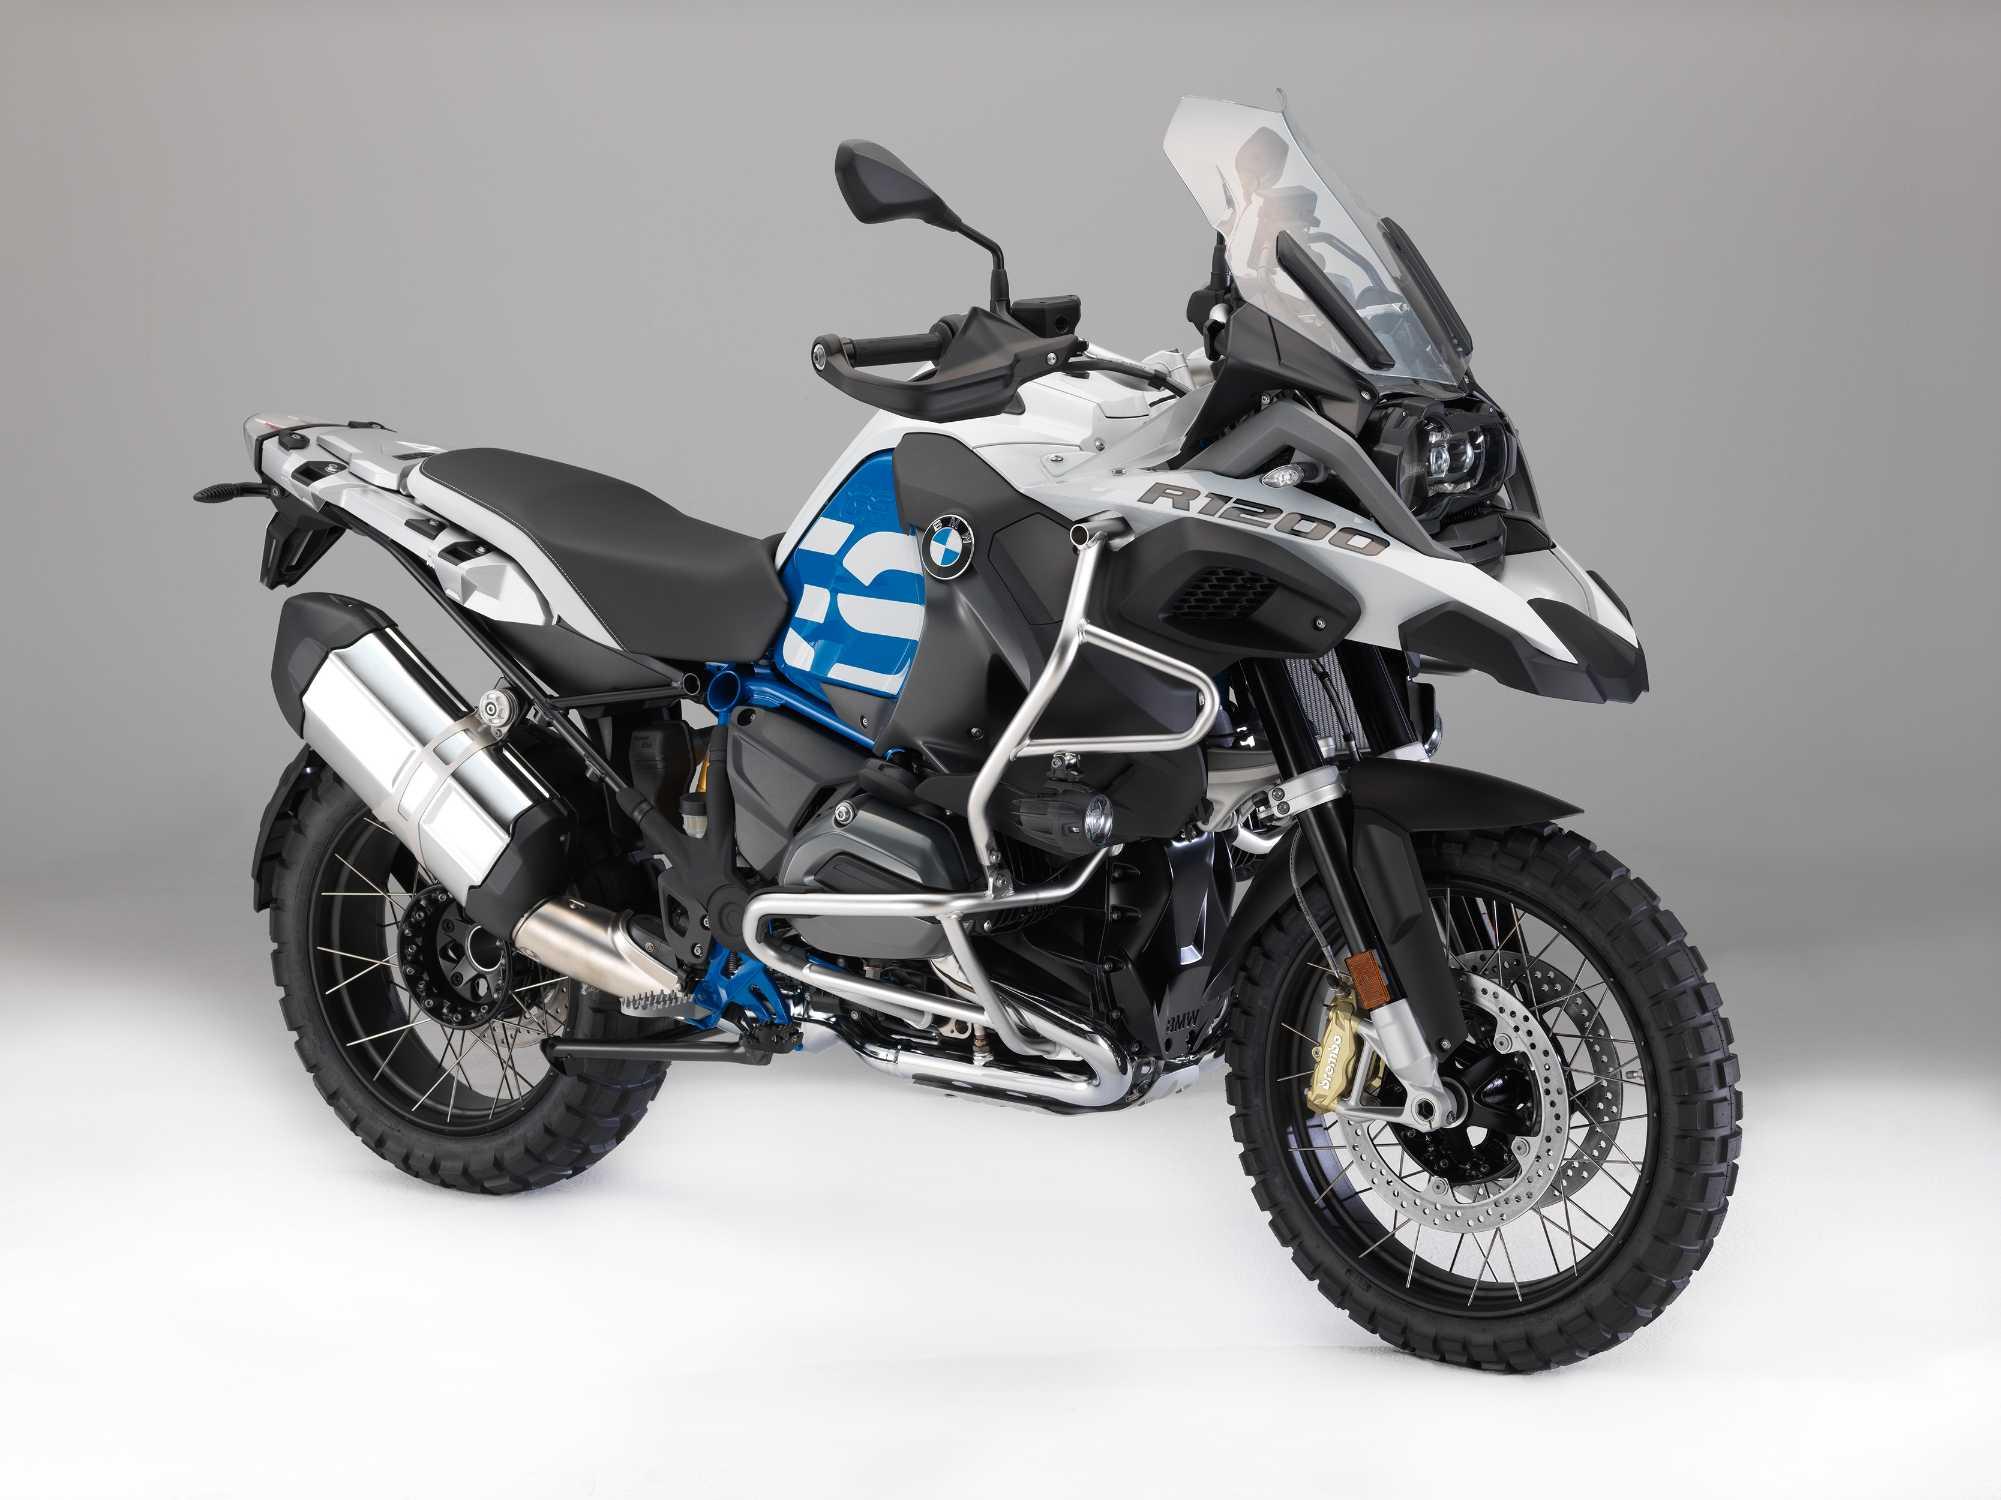 P90268525-bmw-r-1200-gs-adventure-style-rallye-07-2017-2001px.jpg